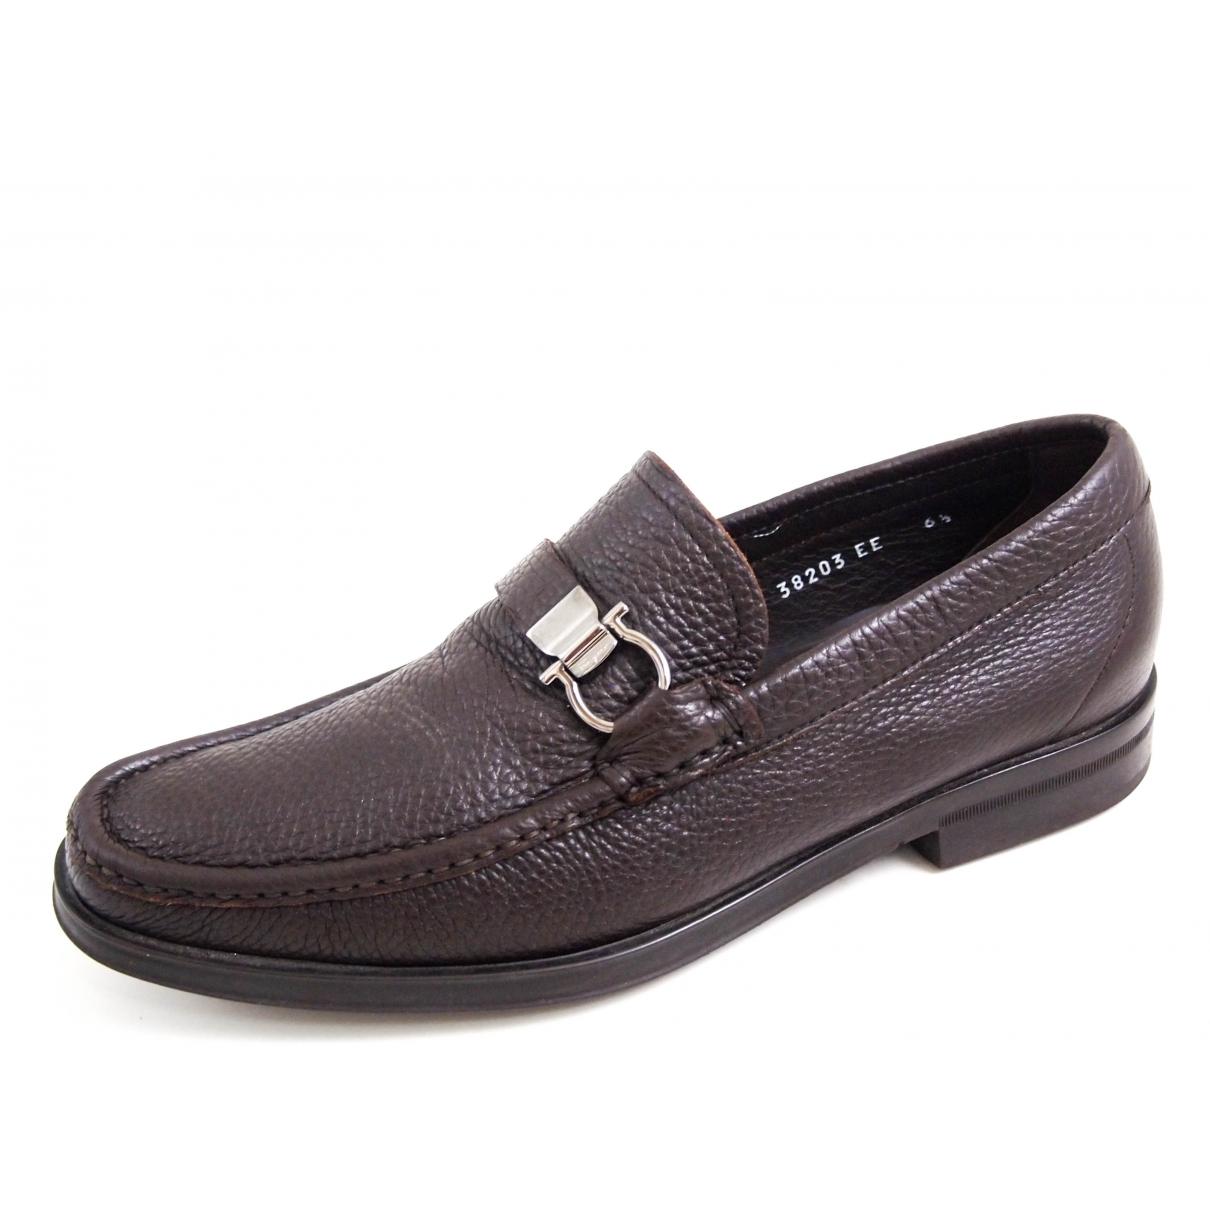 Salvatore Ferragamo \N Brown Leather Flats for Men 40.5 EU